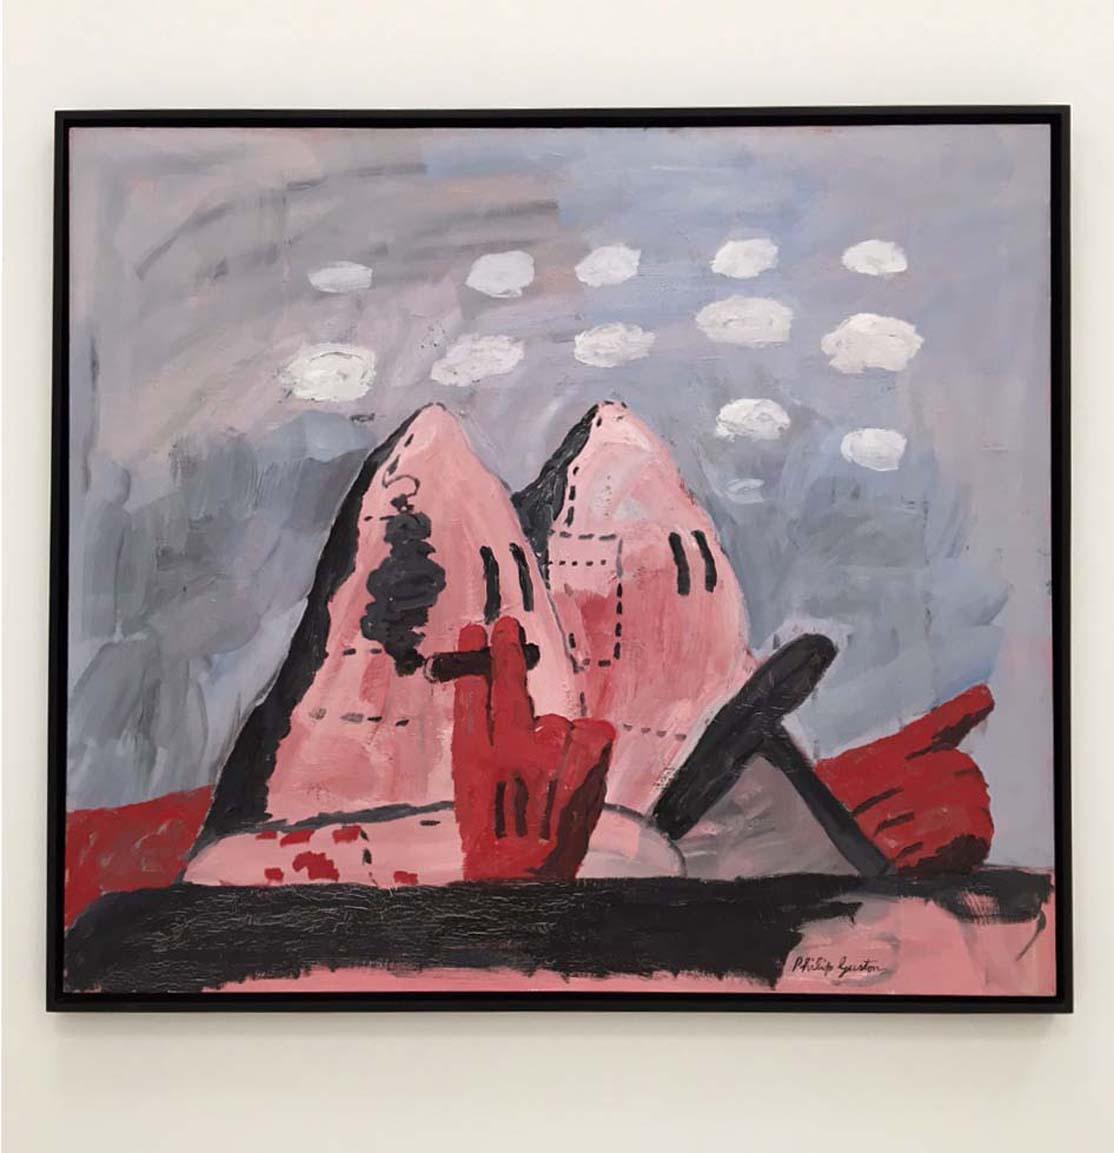 Philip Guston, Ride, 1969